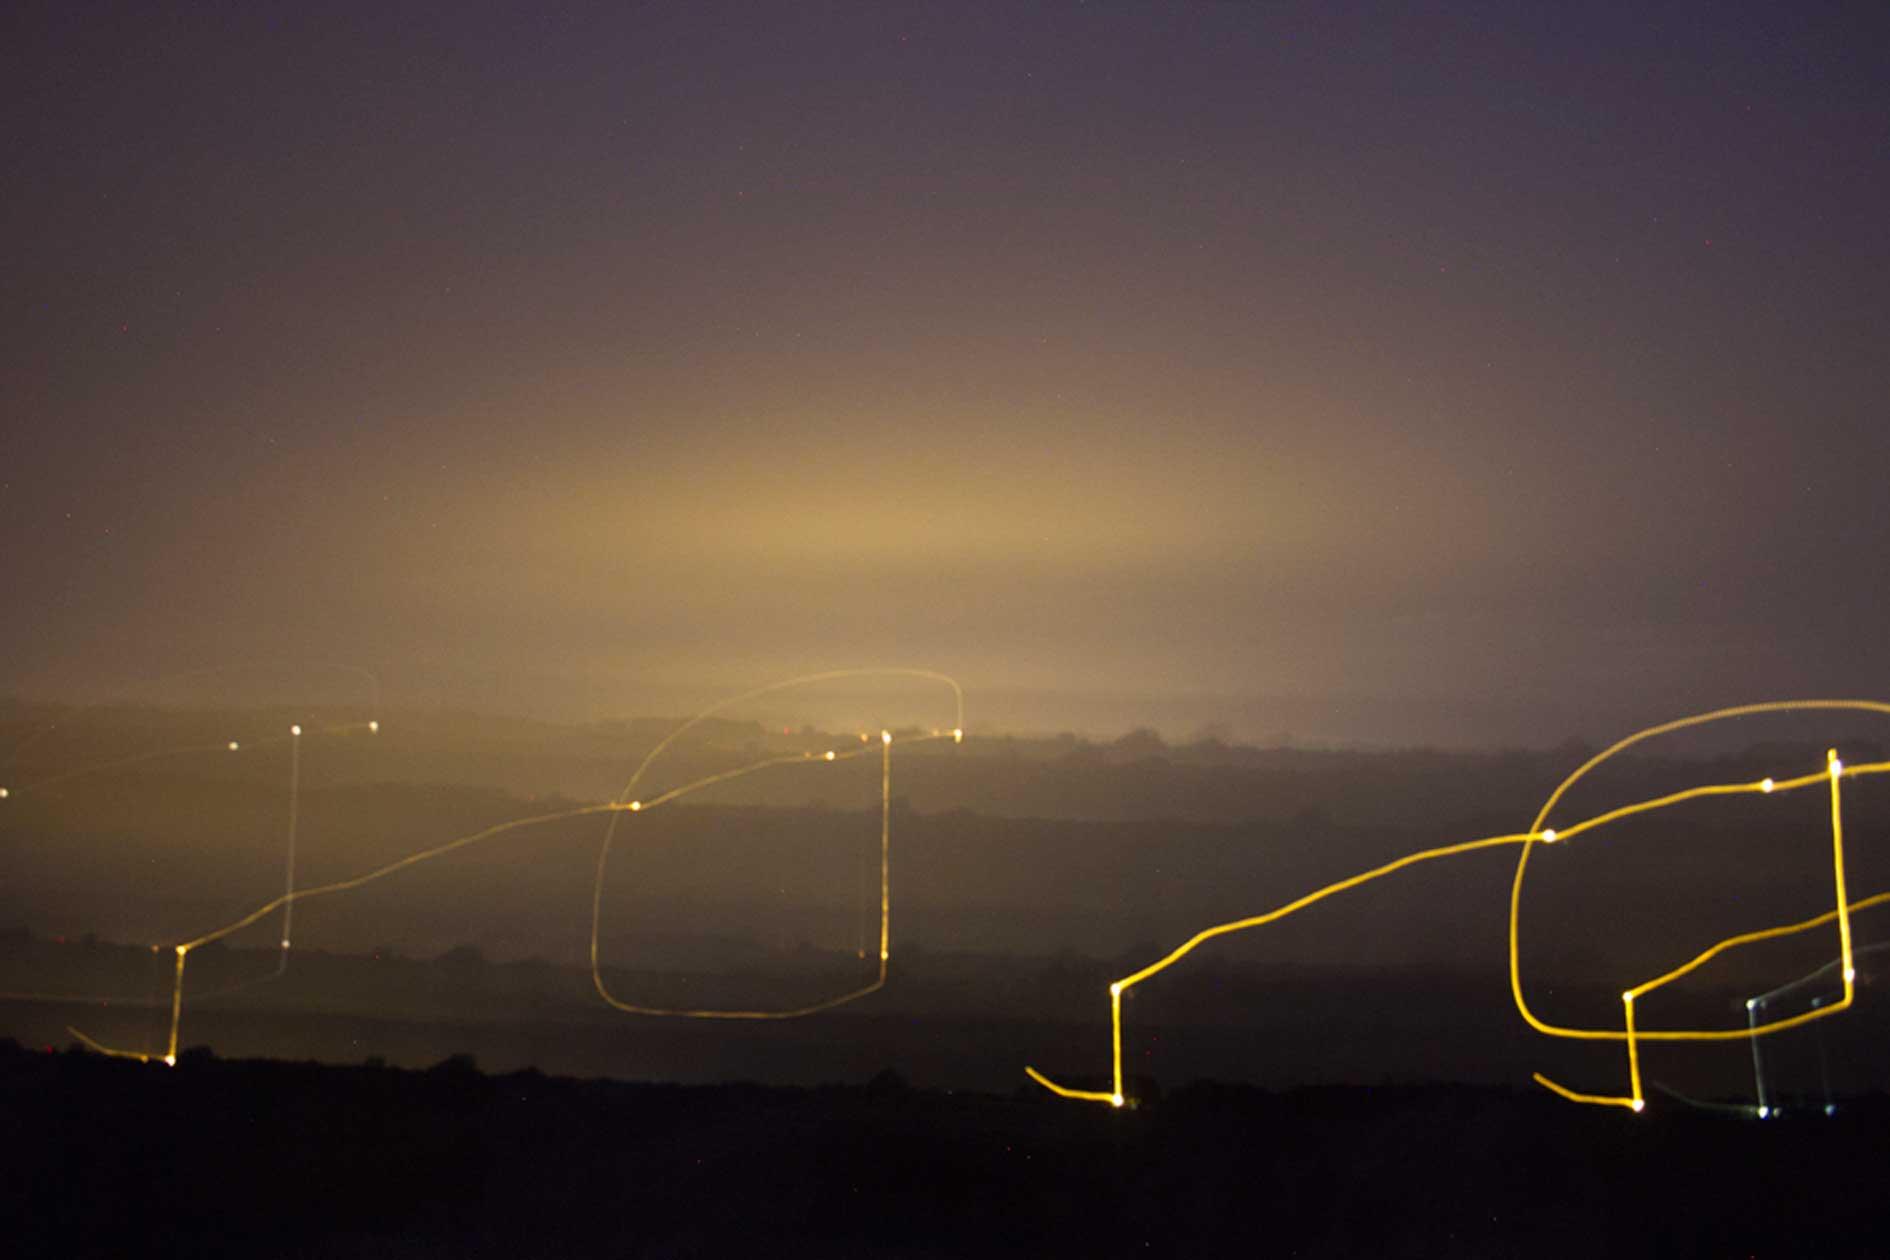 aurora-and-light-painting-1.jpg